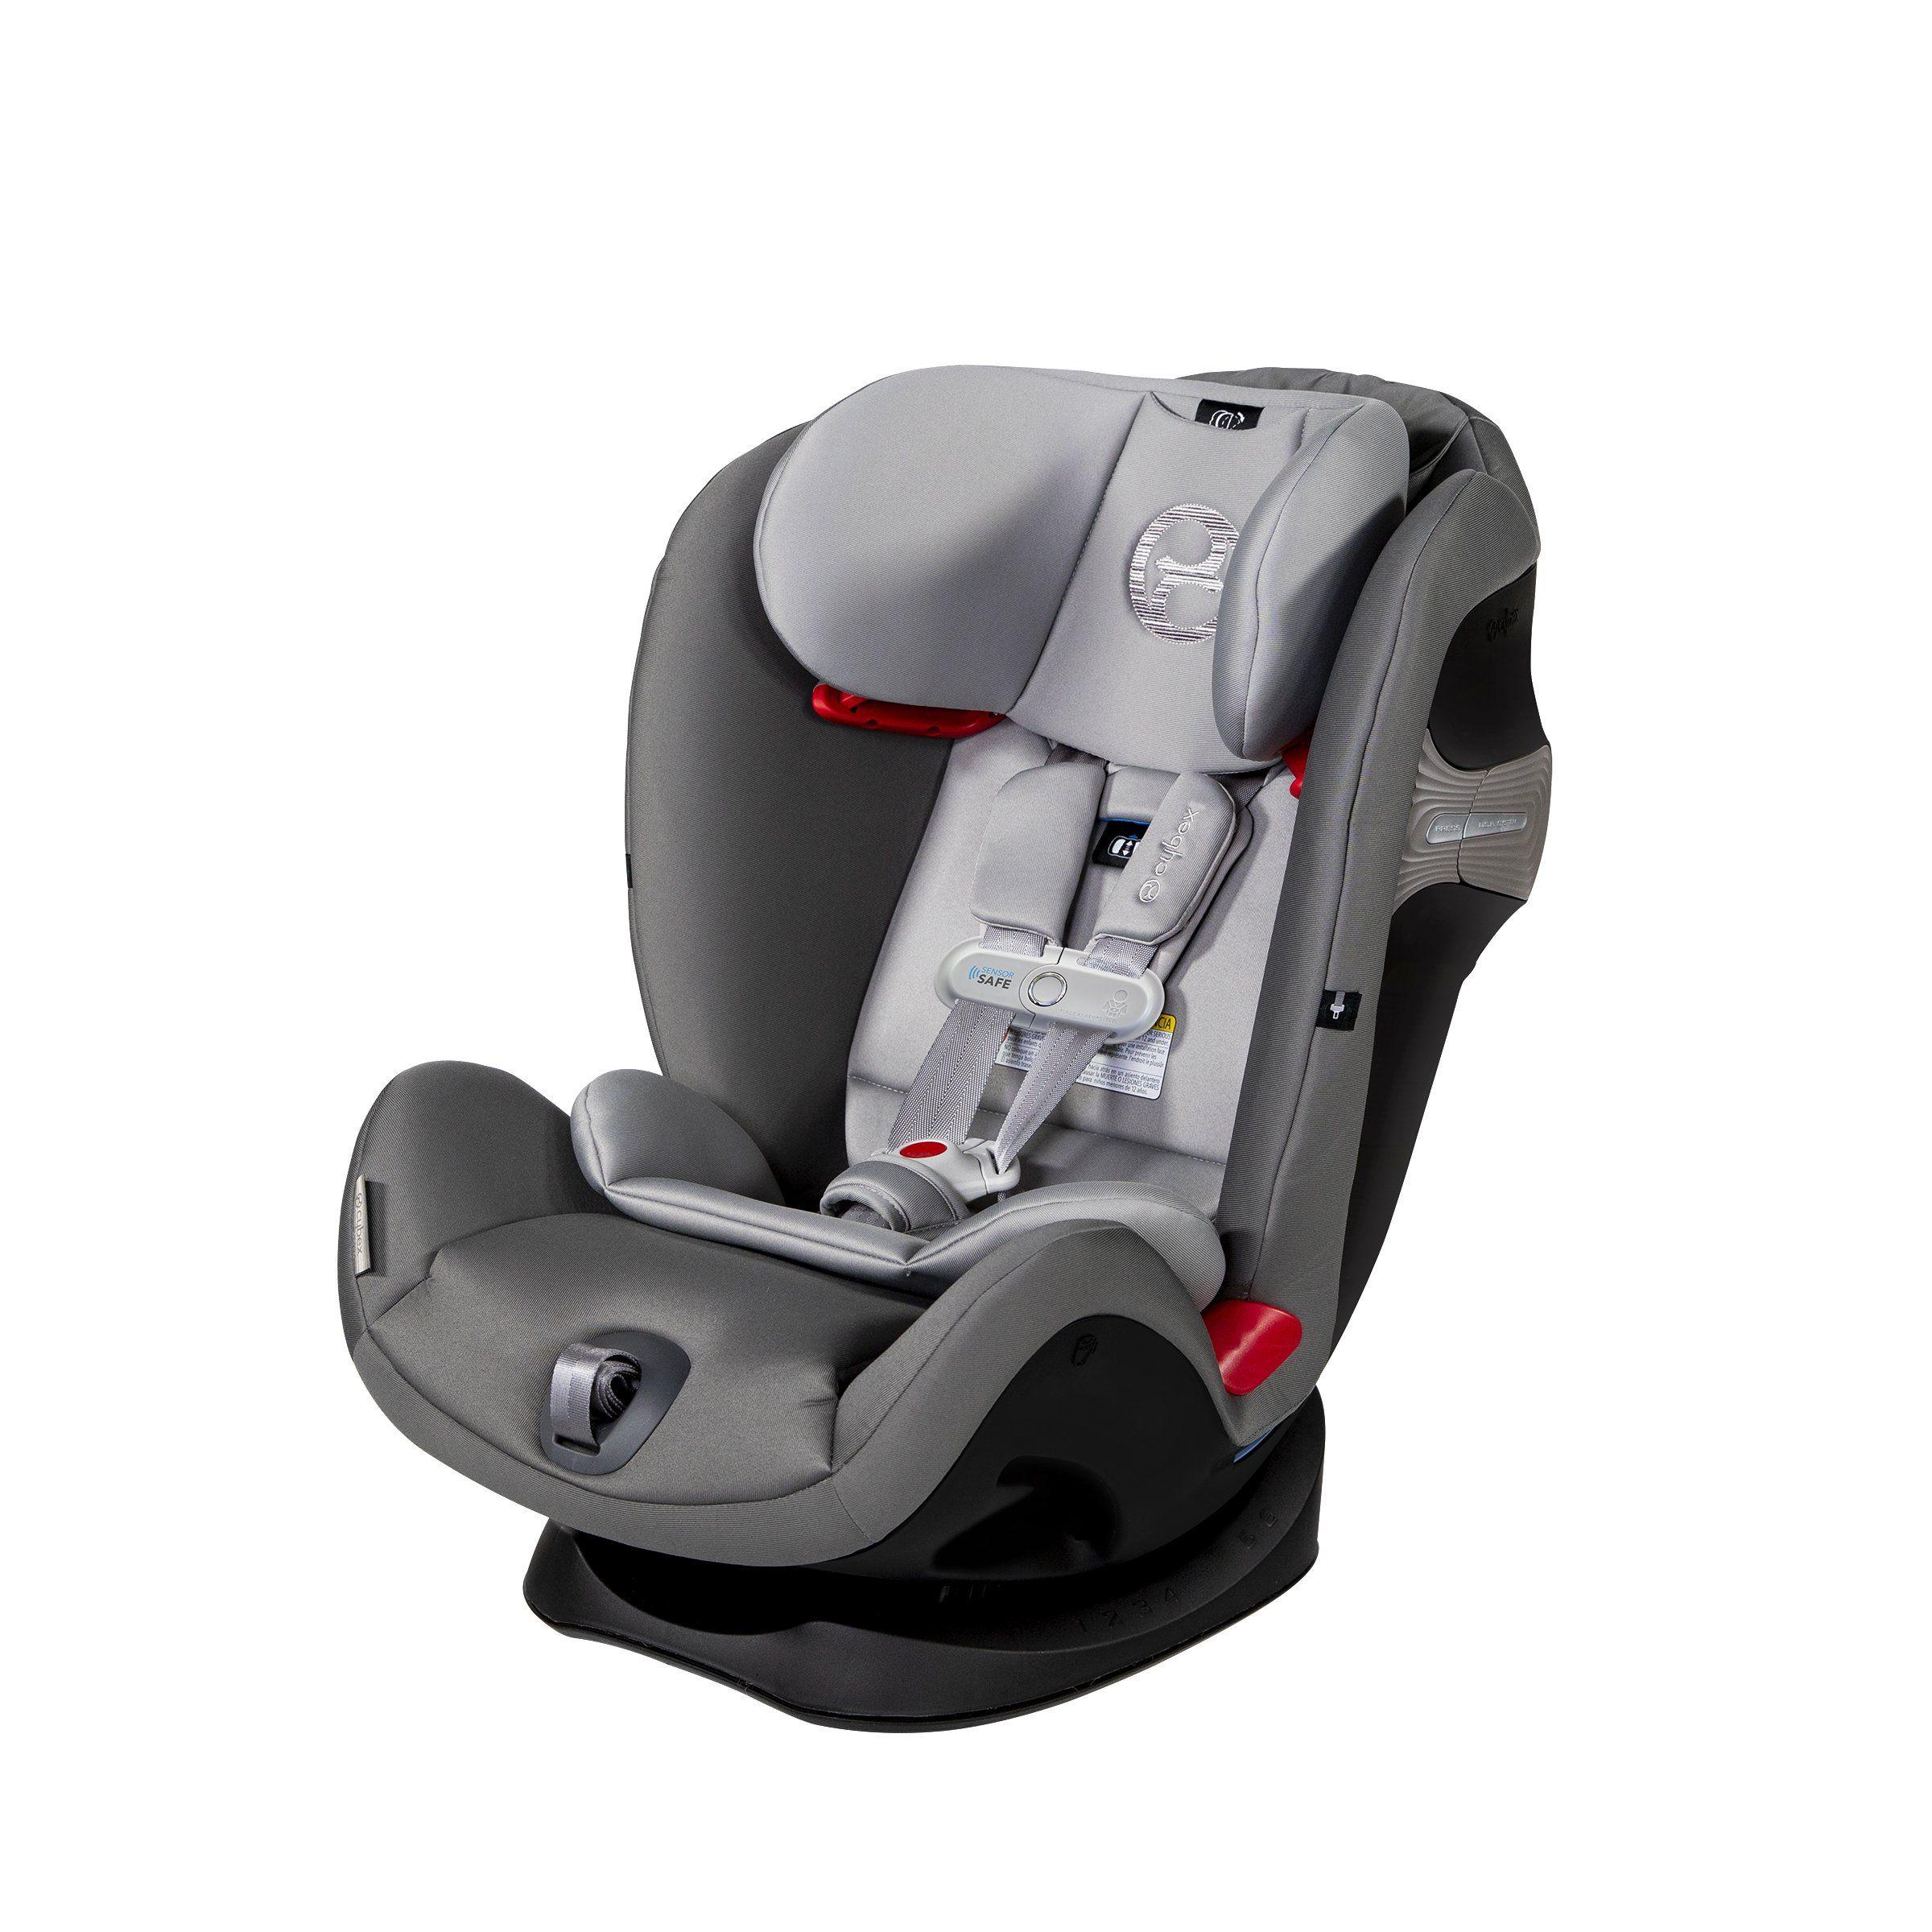 Cybex Eternis S Sensorsafe in Pepper Black   Car seats ...